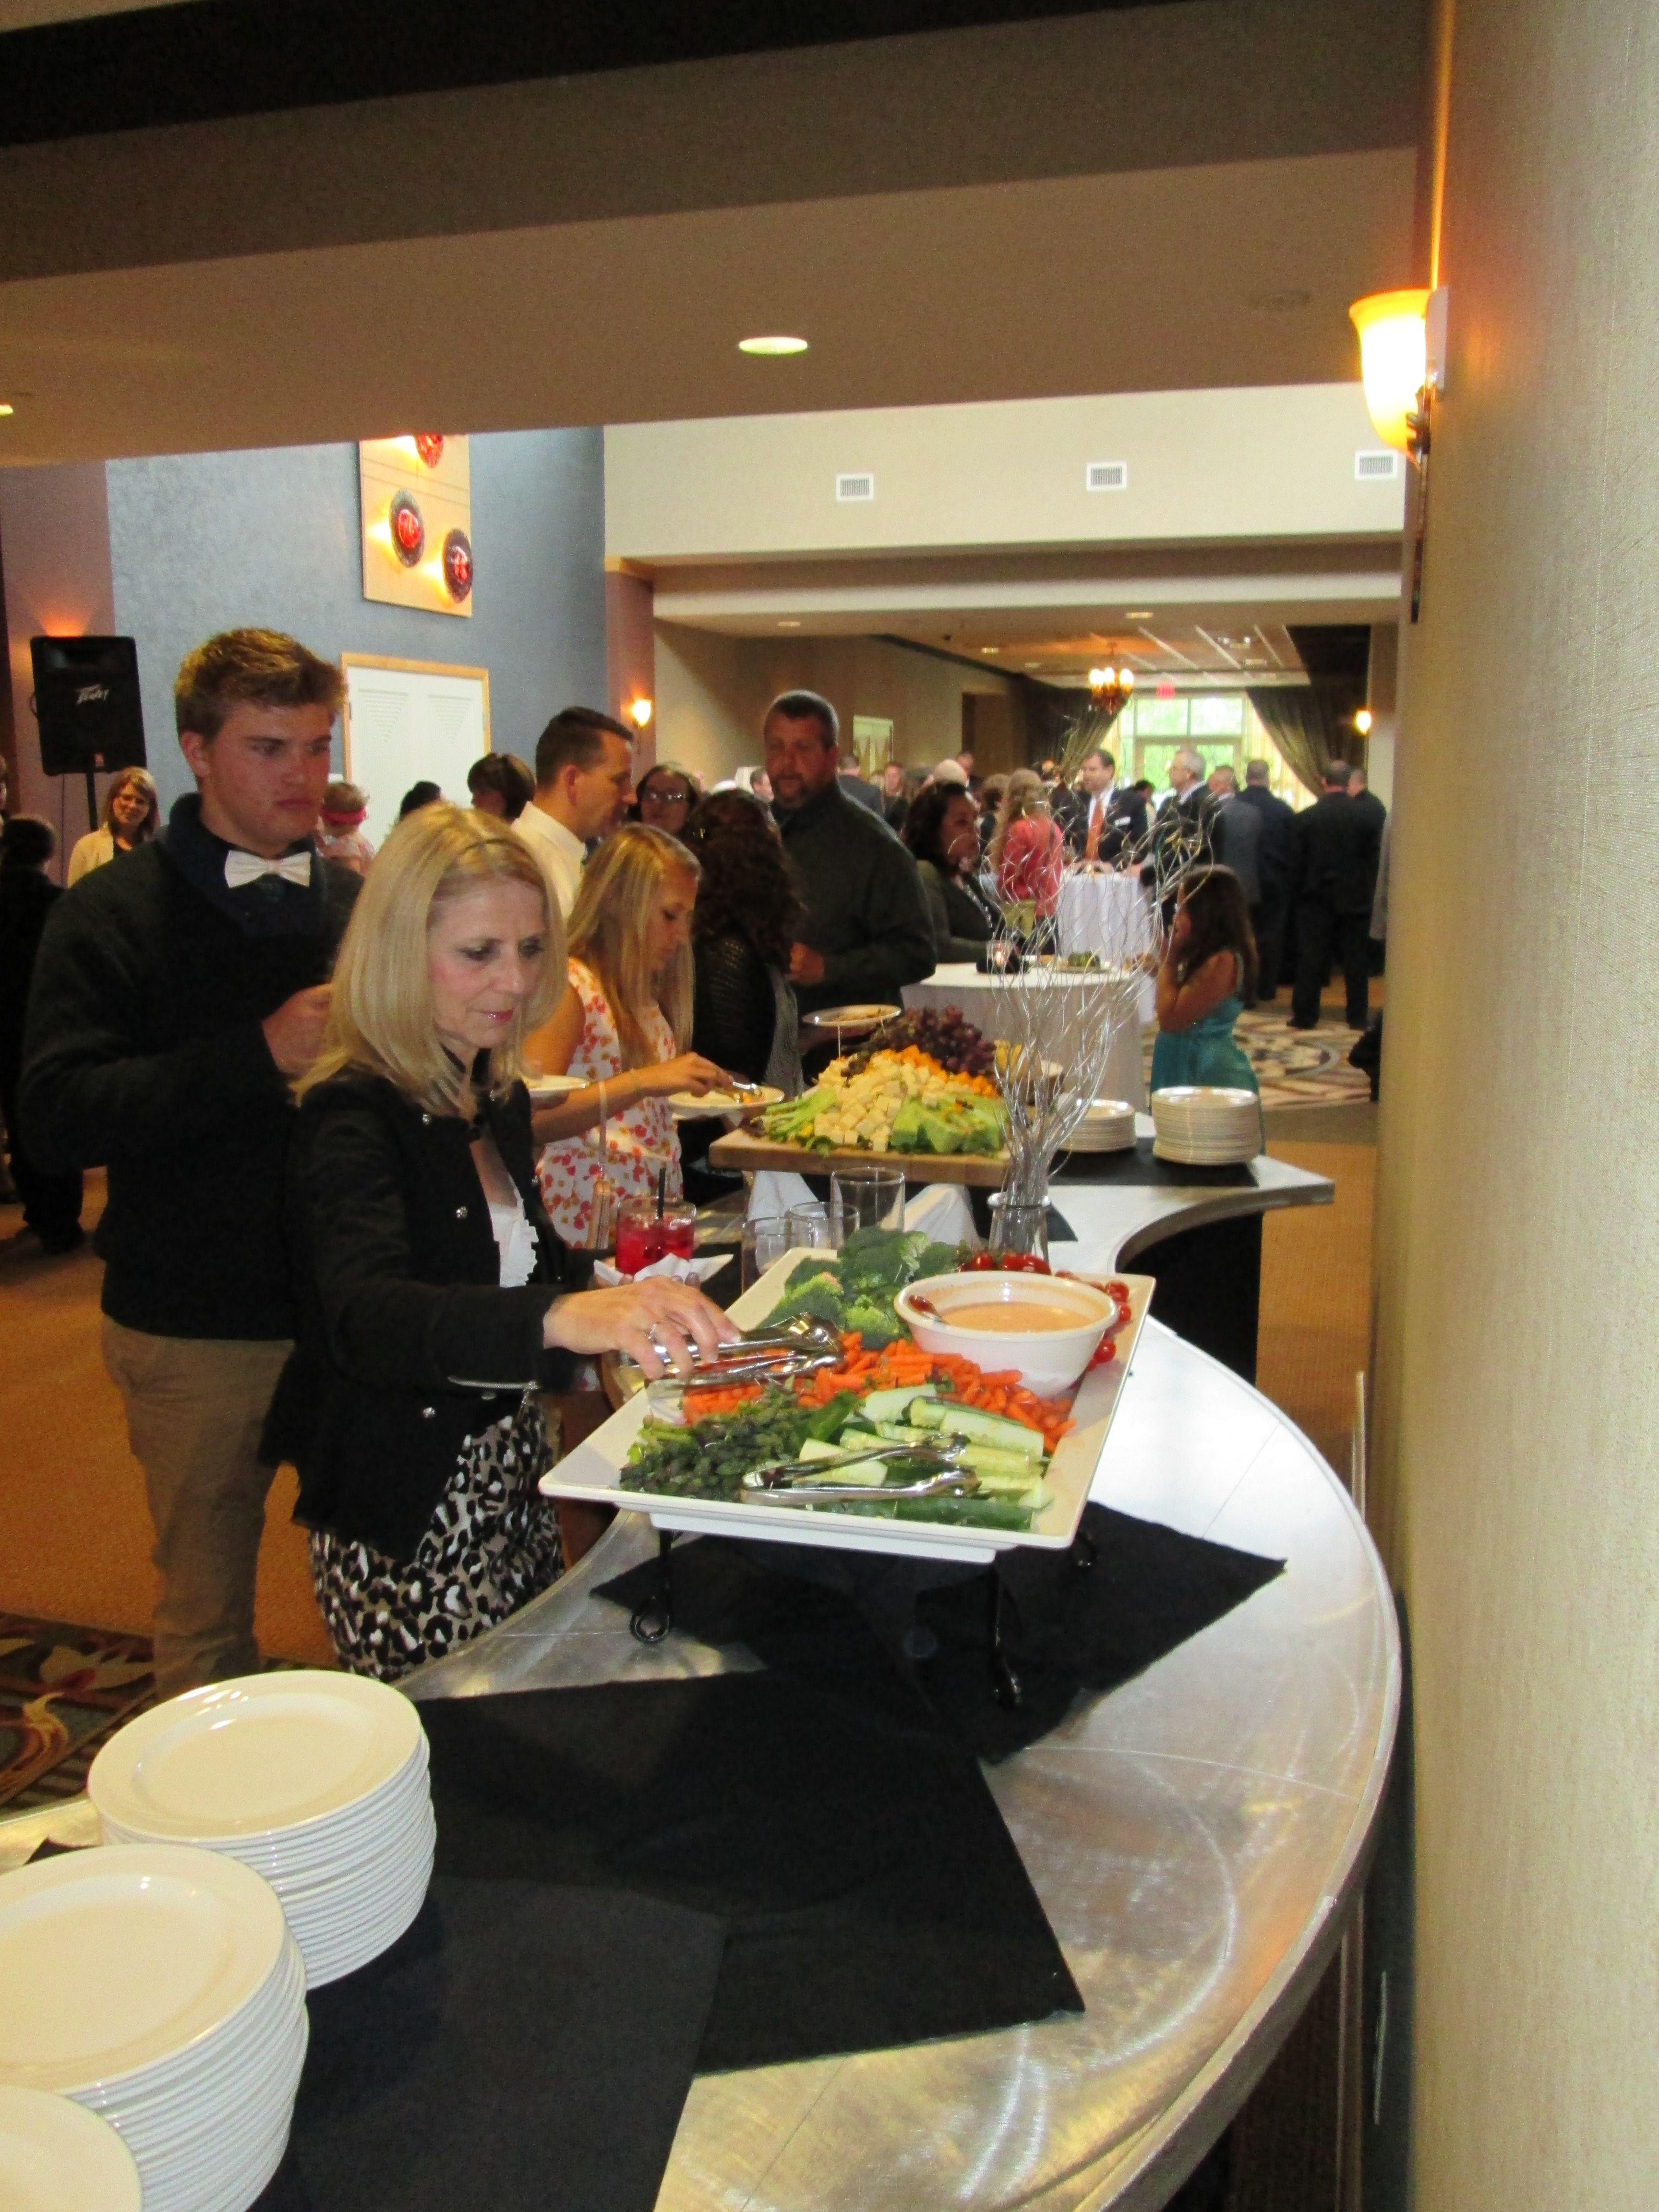 Wedding reception at the Hilton Garden Inn Perrysburg, Ohio- foyer ...